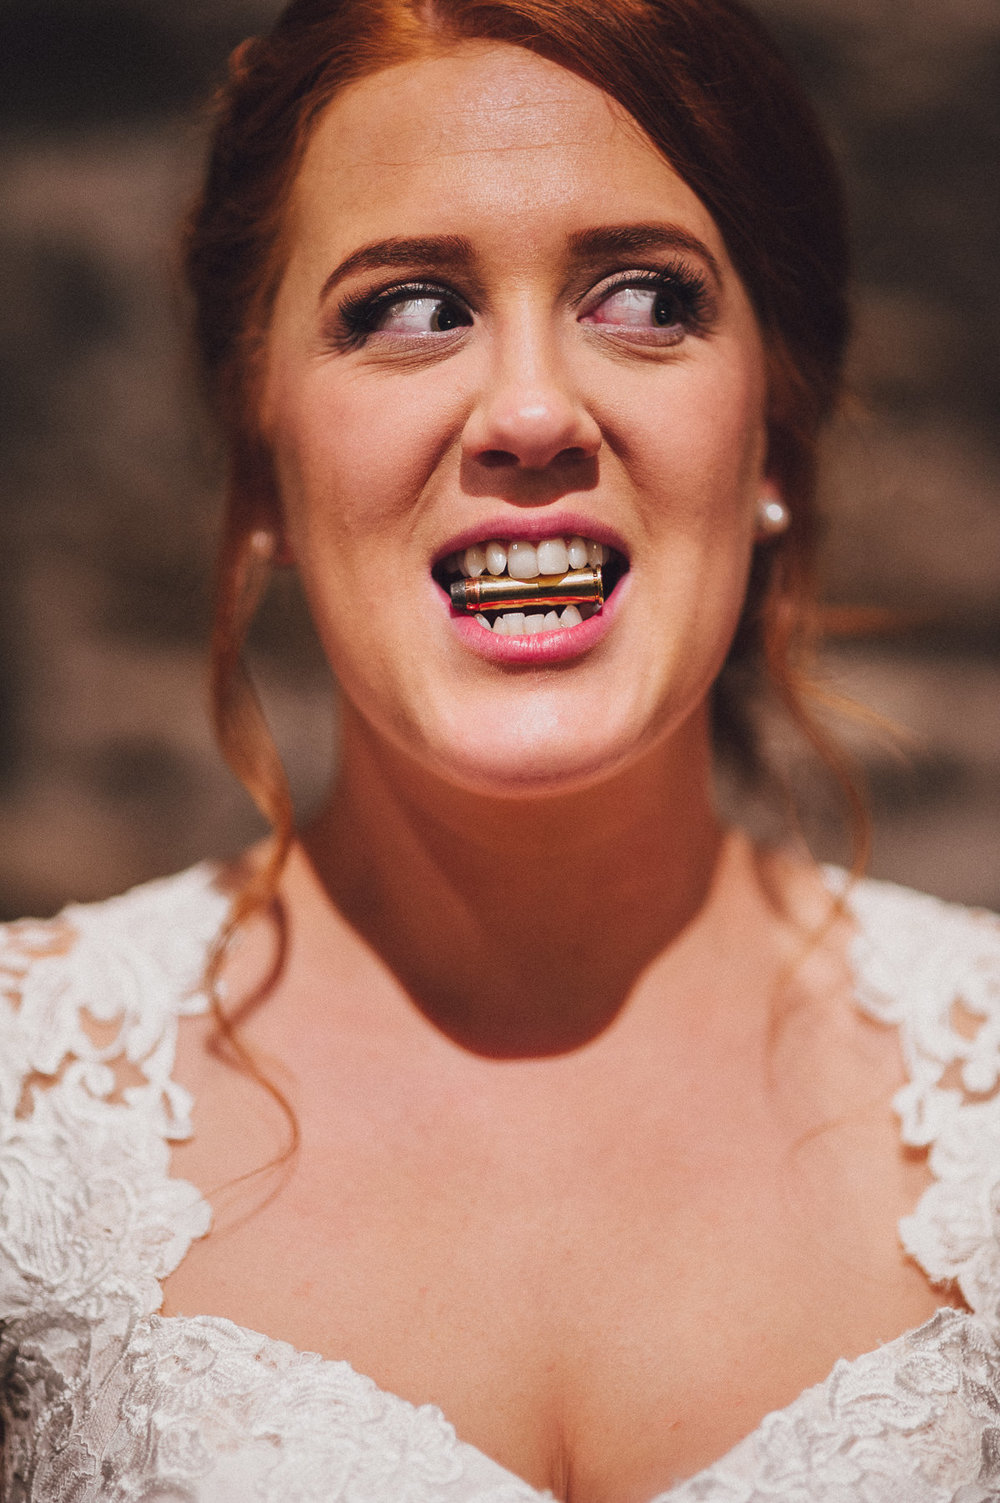 breighton-and-basette-photography-copyrighted-image-blog-amanda-and-eric-wedding-108.jpg